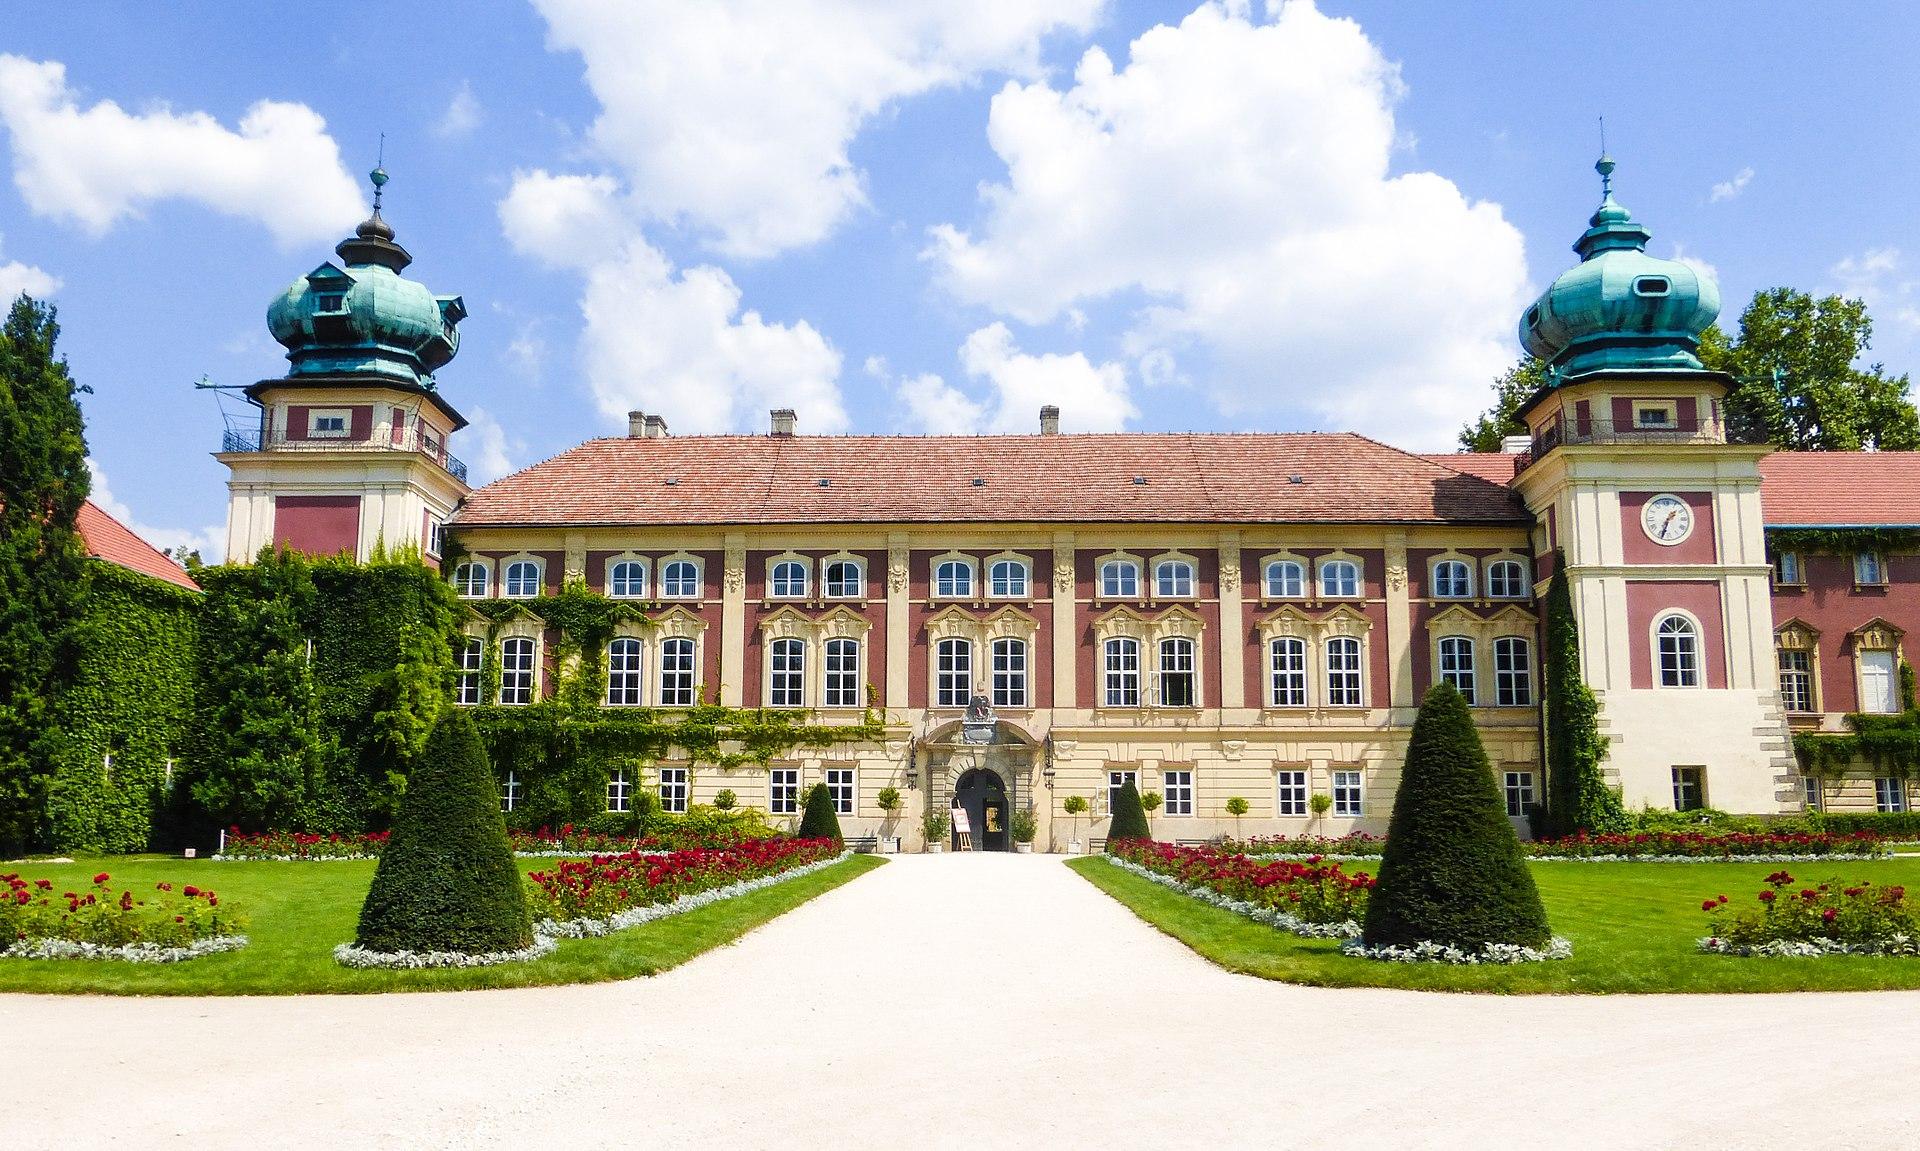 %C5%81a%C5%84cut_Castle on Baroque Style Interior Design